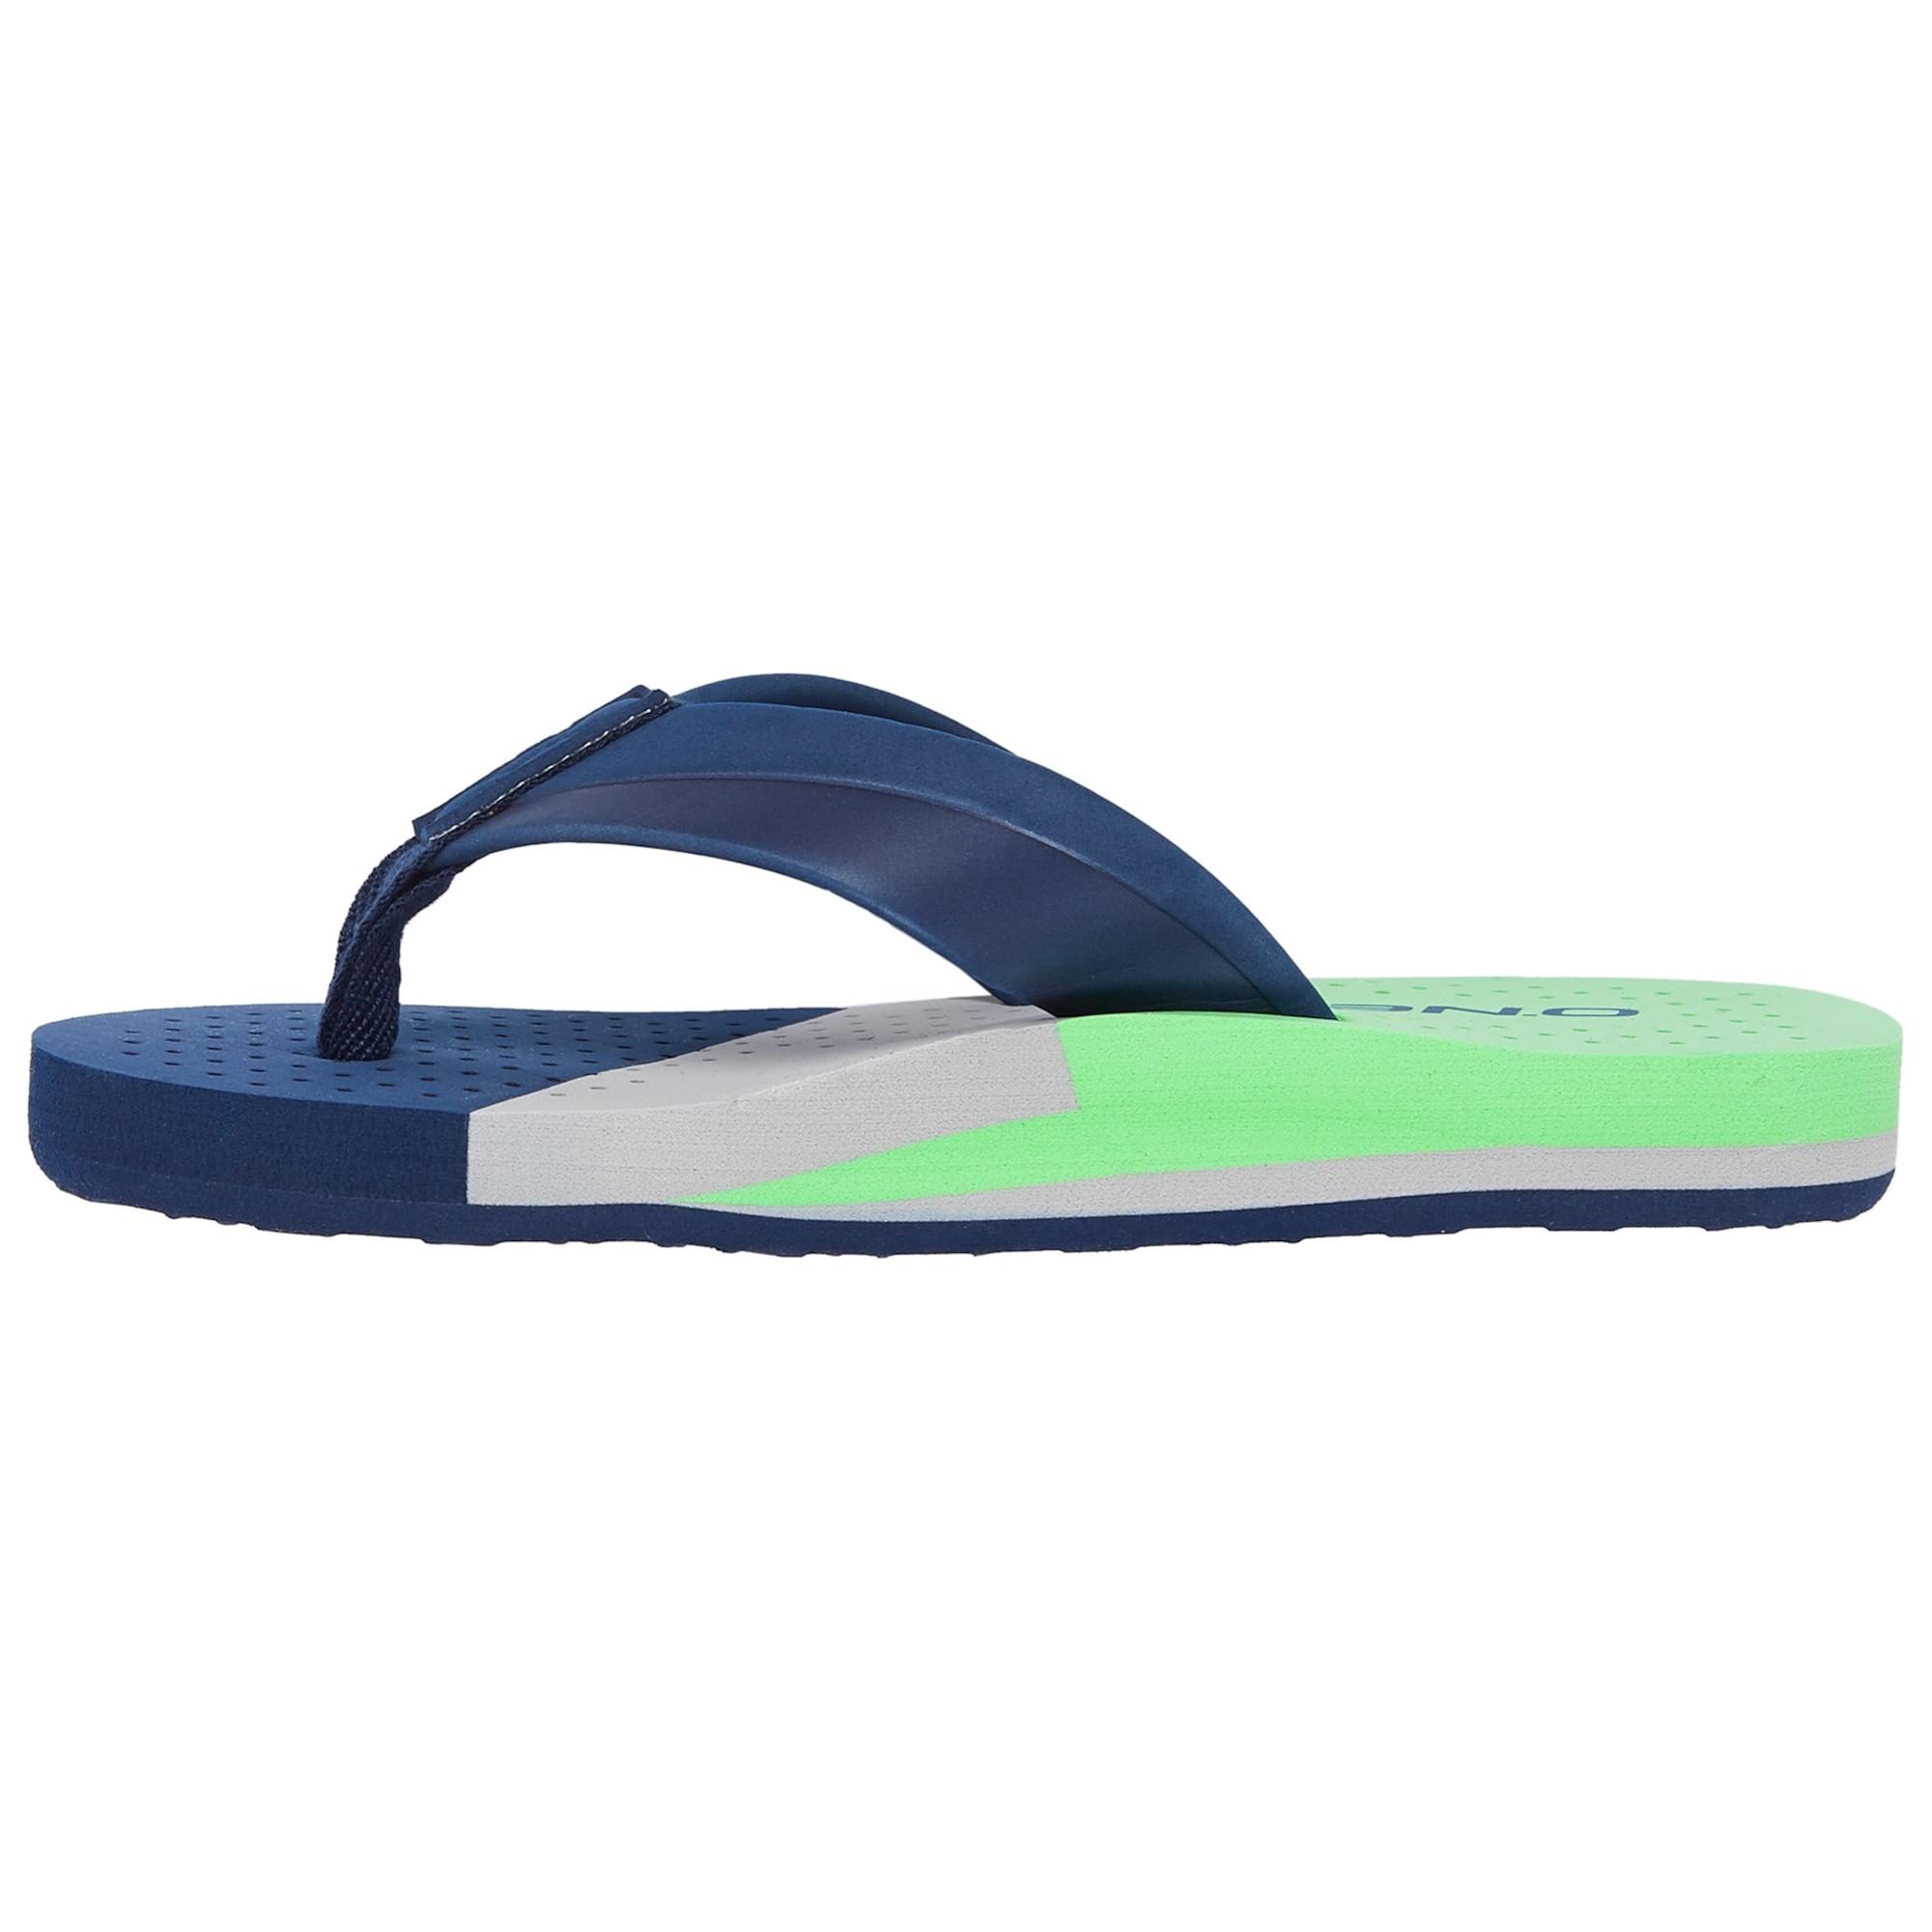 ONEILL Otevřená obuv FB IMPRINT PUNCH SANDALS modrá zelená O'NEILL